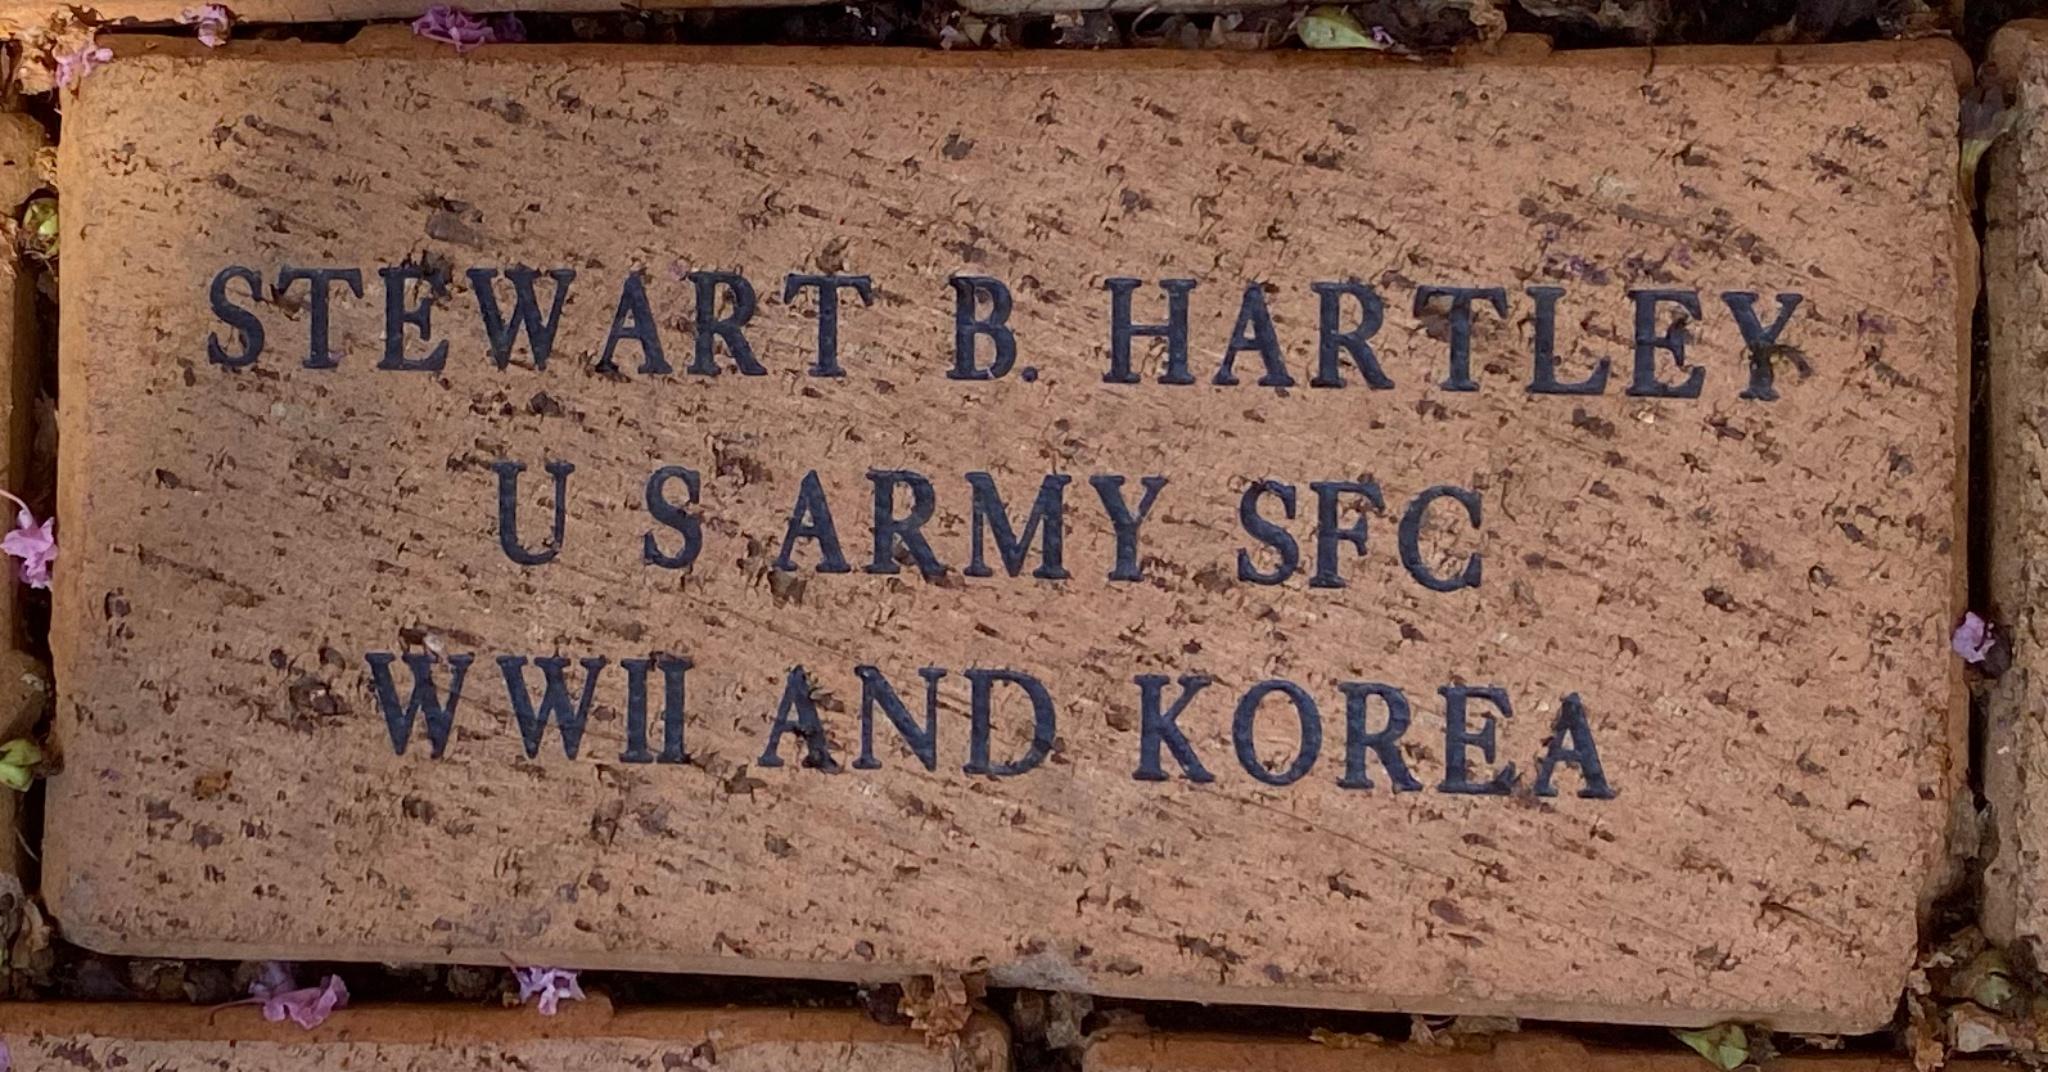 STEWART B. HARTLEY U S ARMY SFC WWII AND KOREA